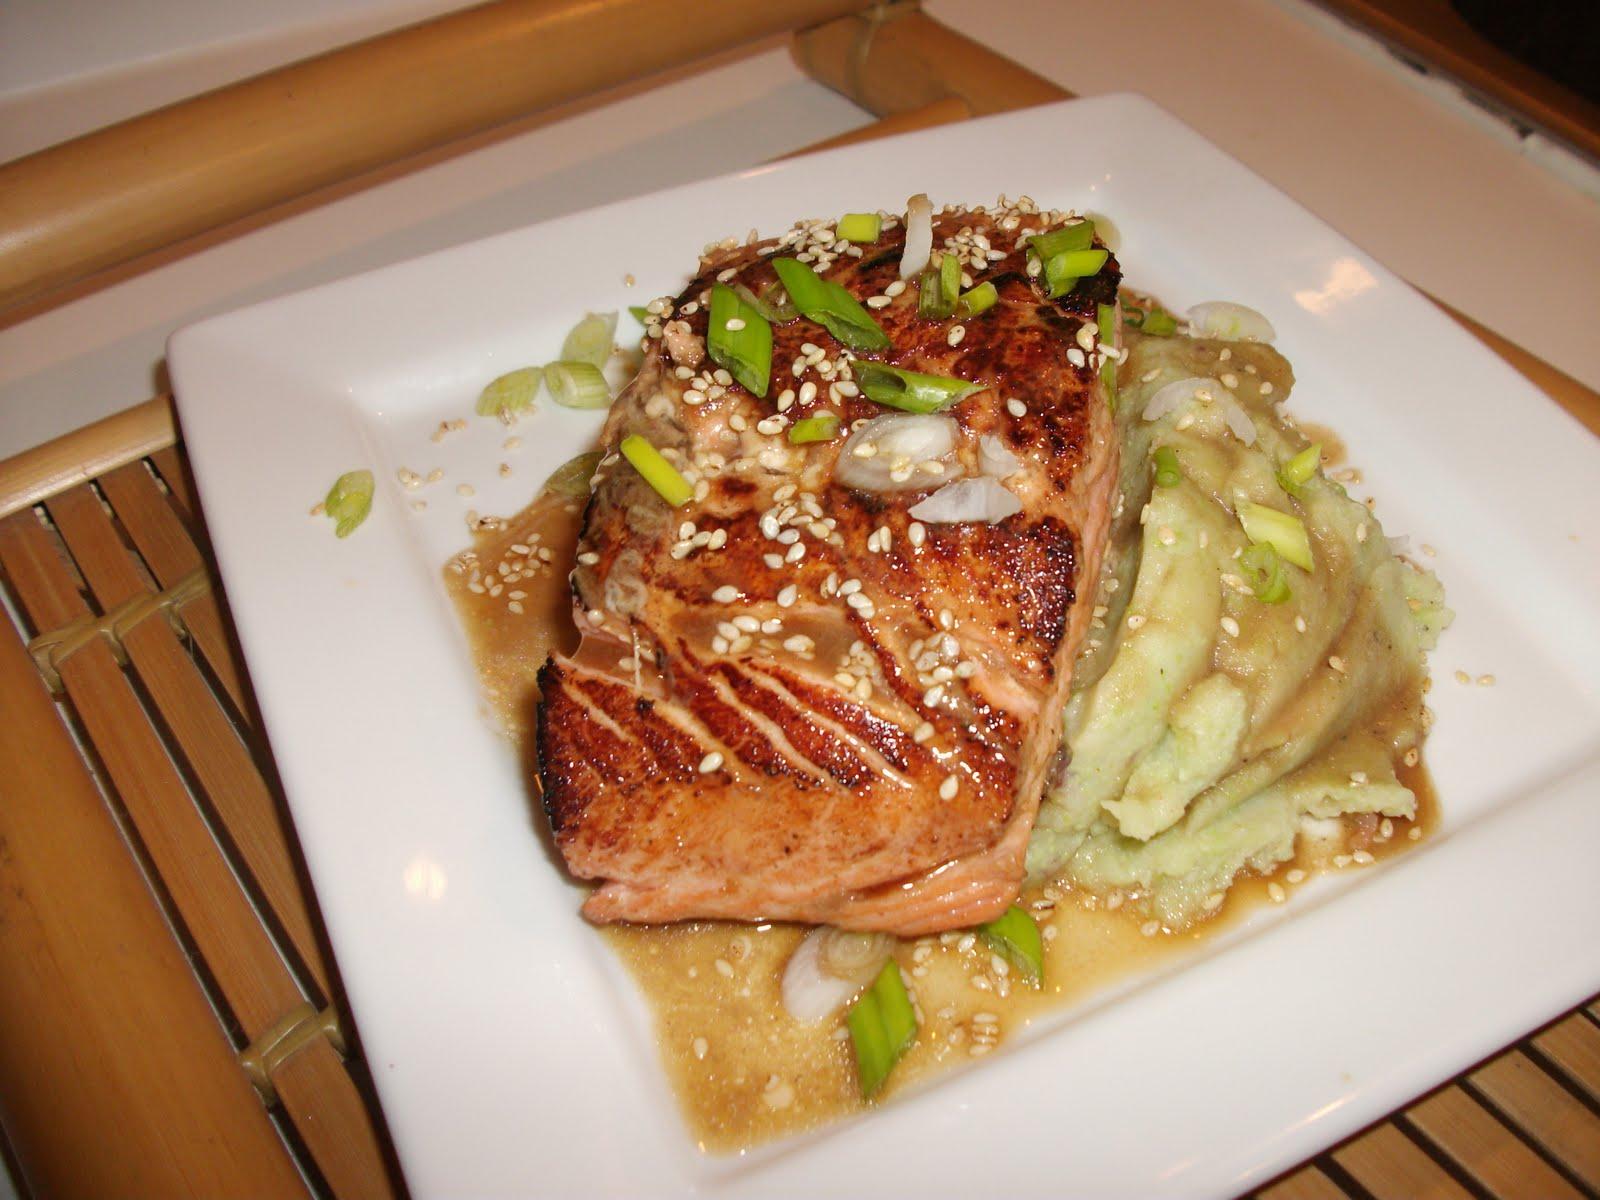 ... Salmon with Wasabi Potato-Edamame Mash - From Everyday To Gourmet